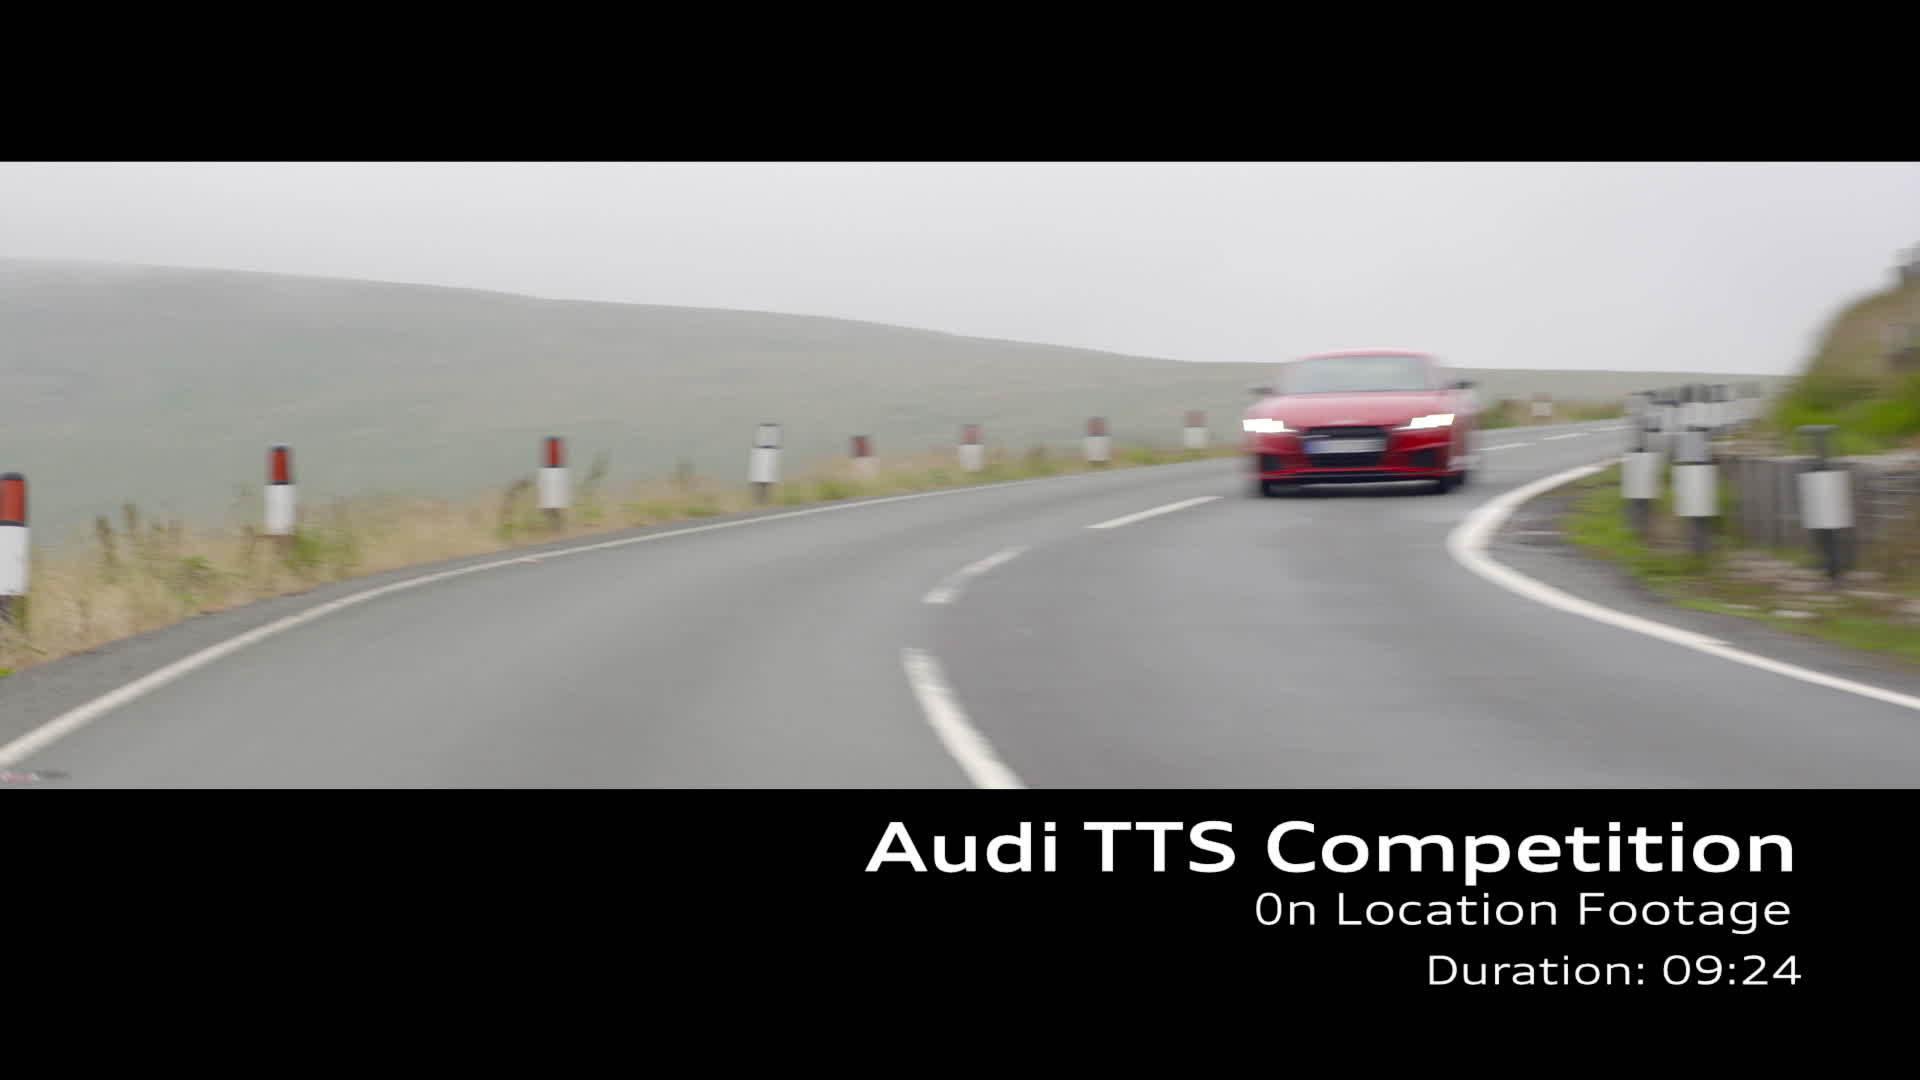 Audi TTS Footage Tango red